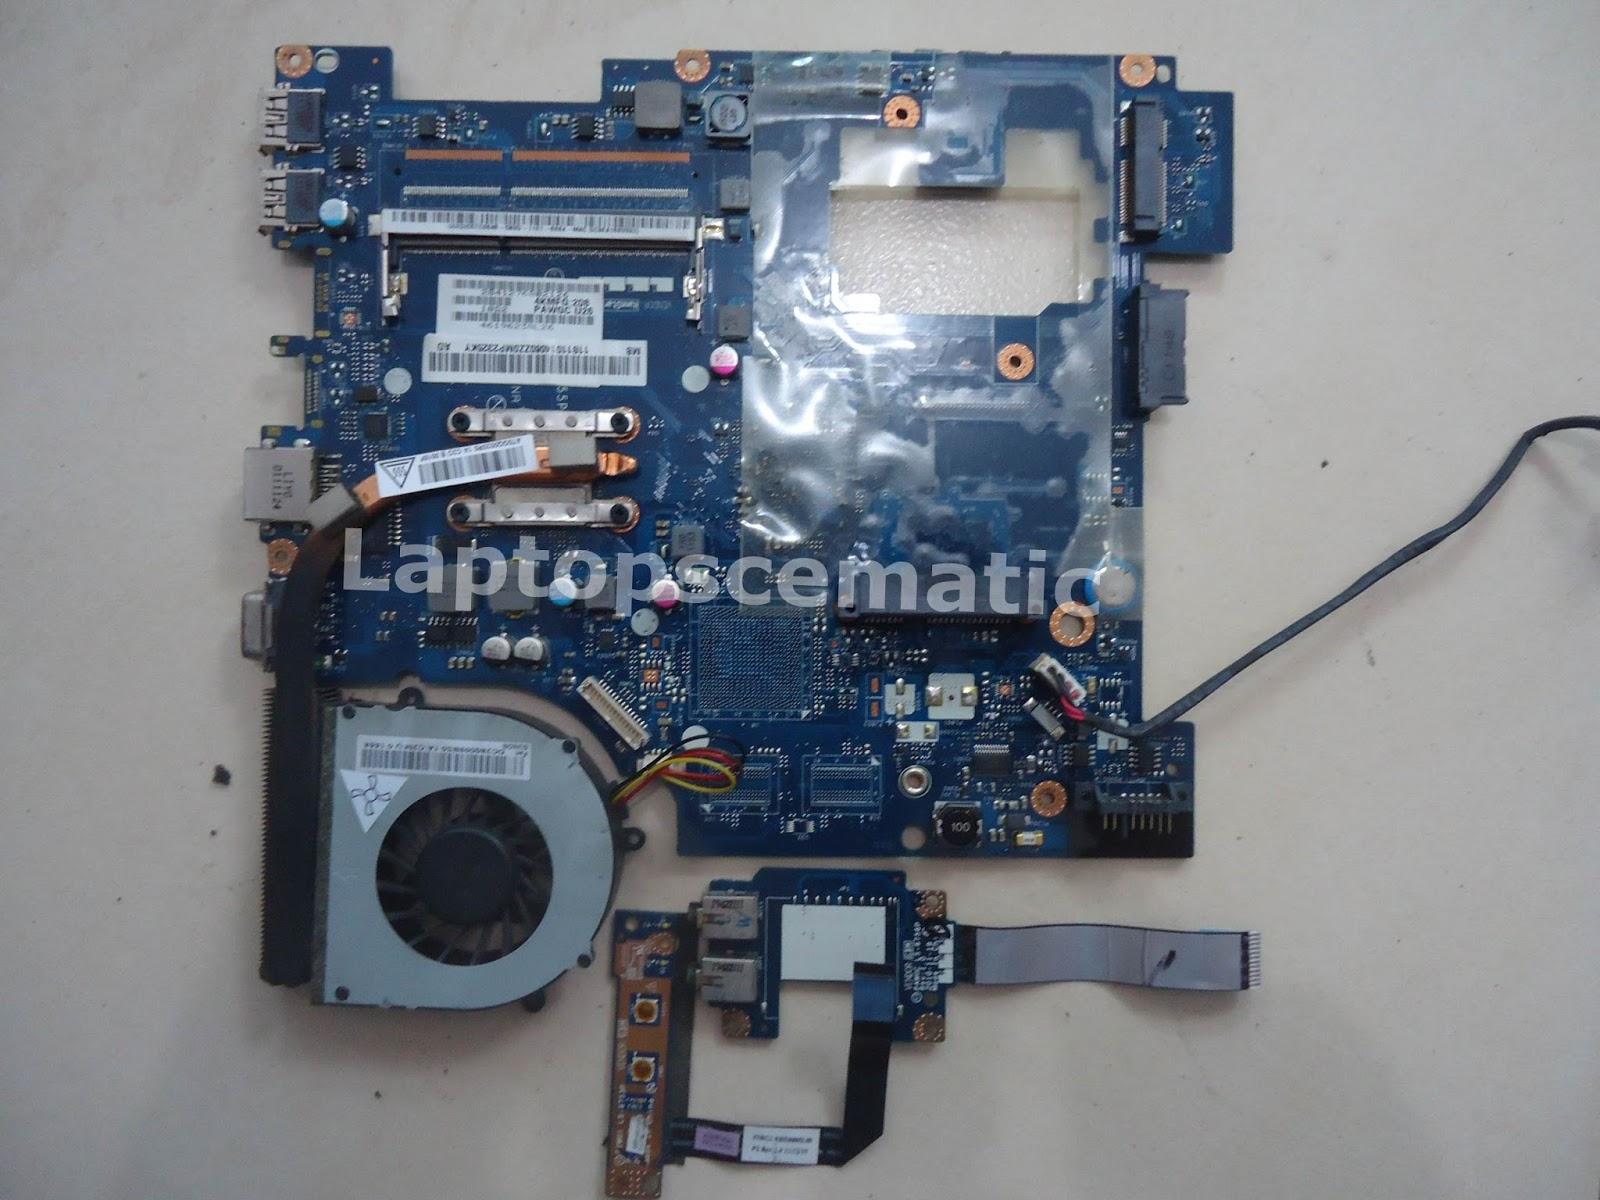 Motherboard Lenovo G475 Mainboard Code Pawgc La